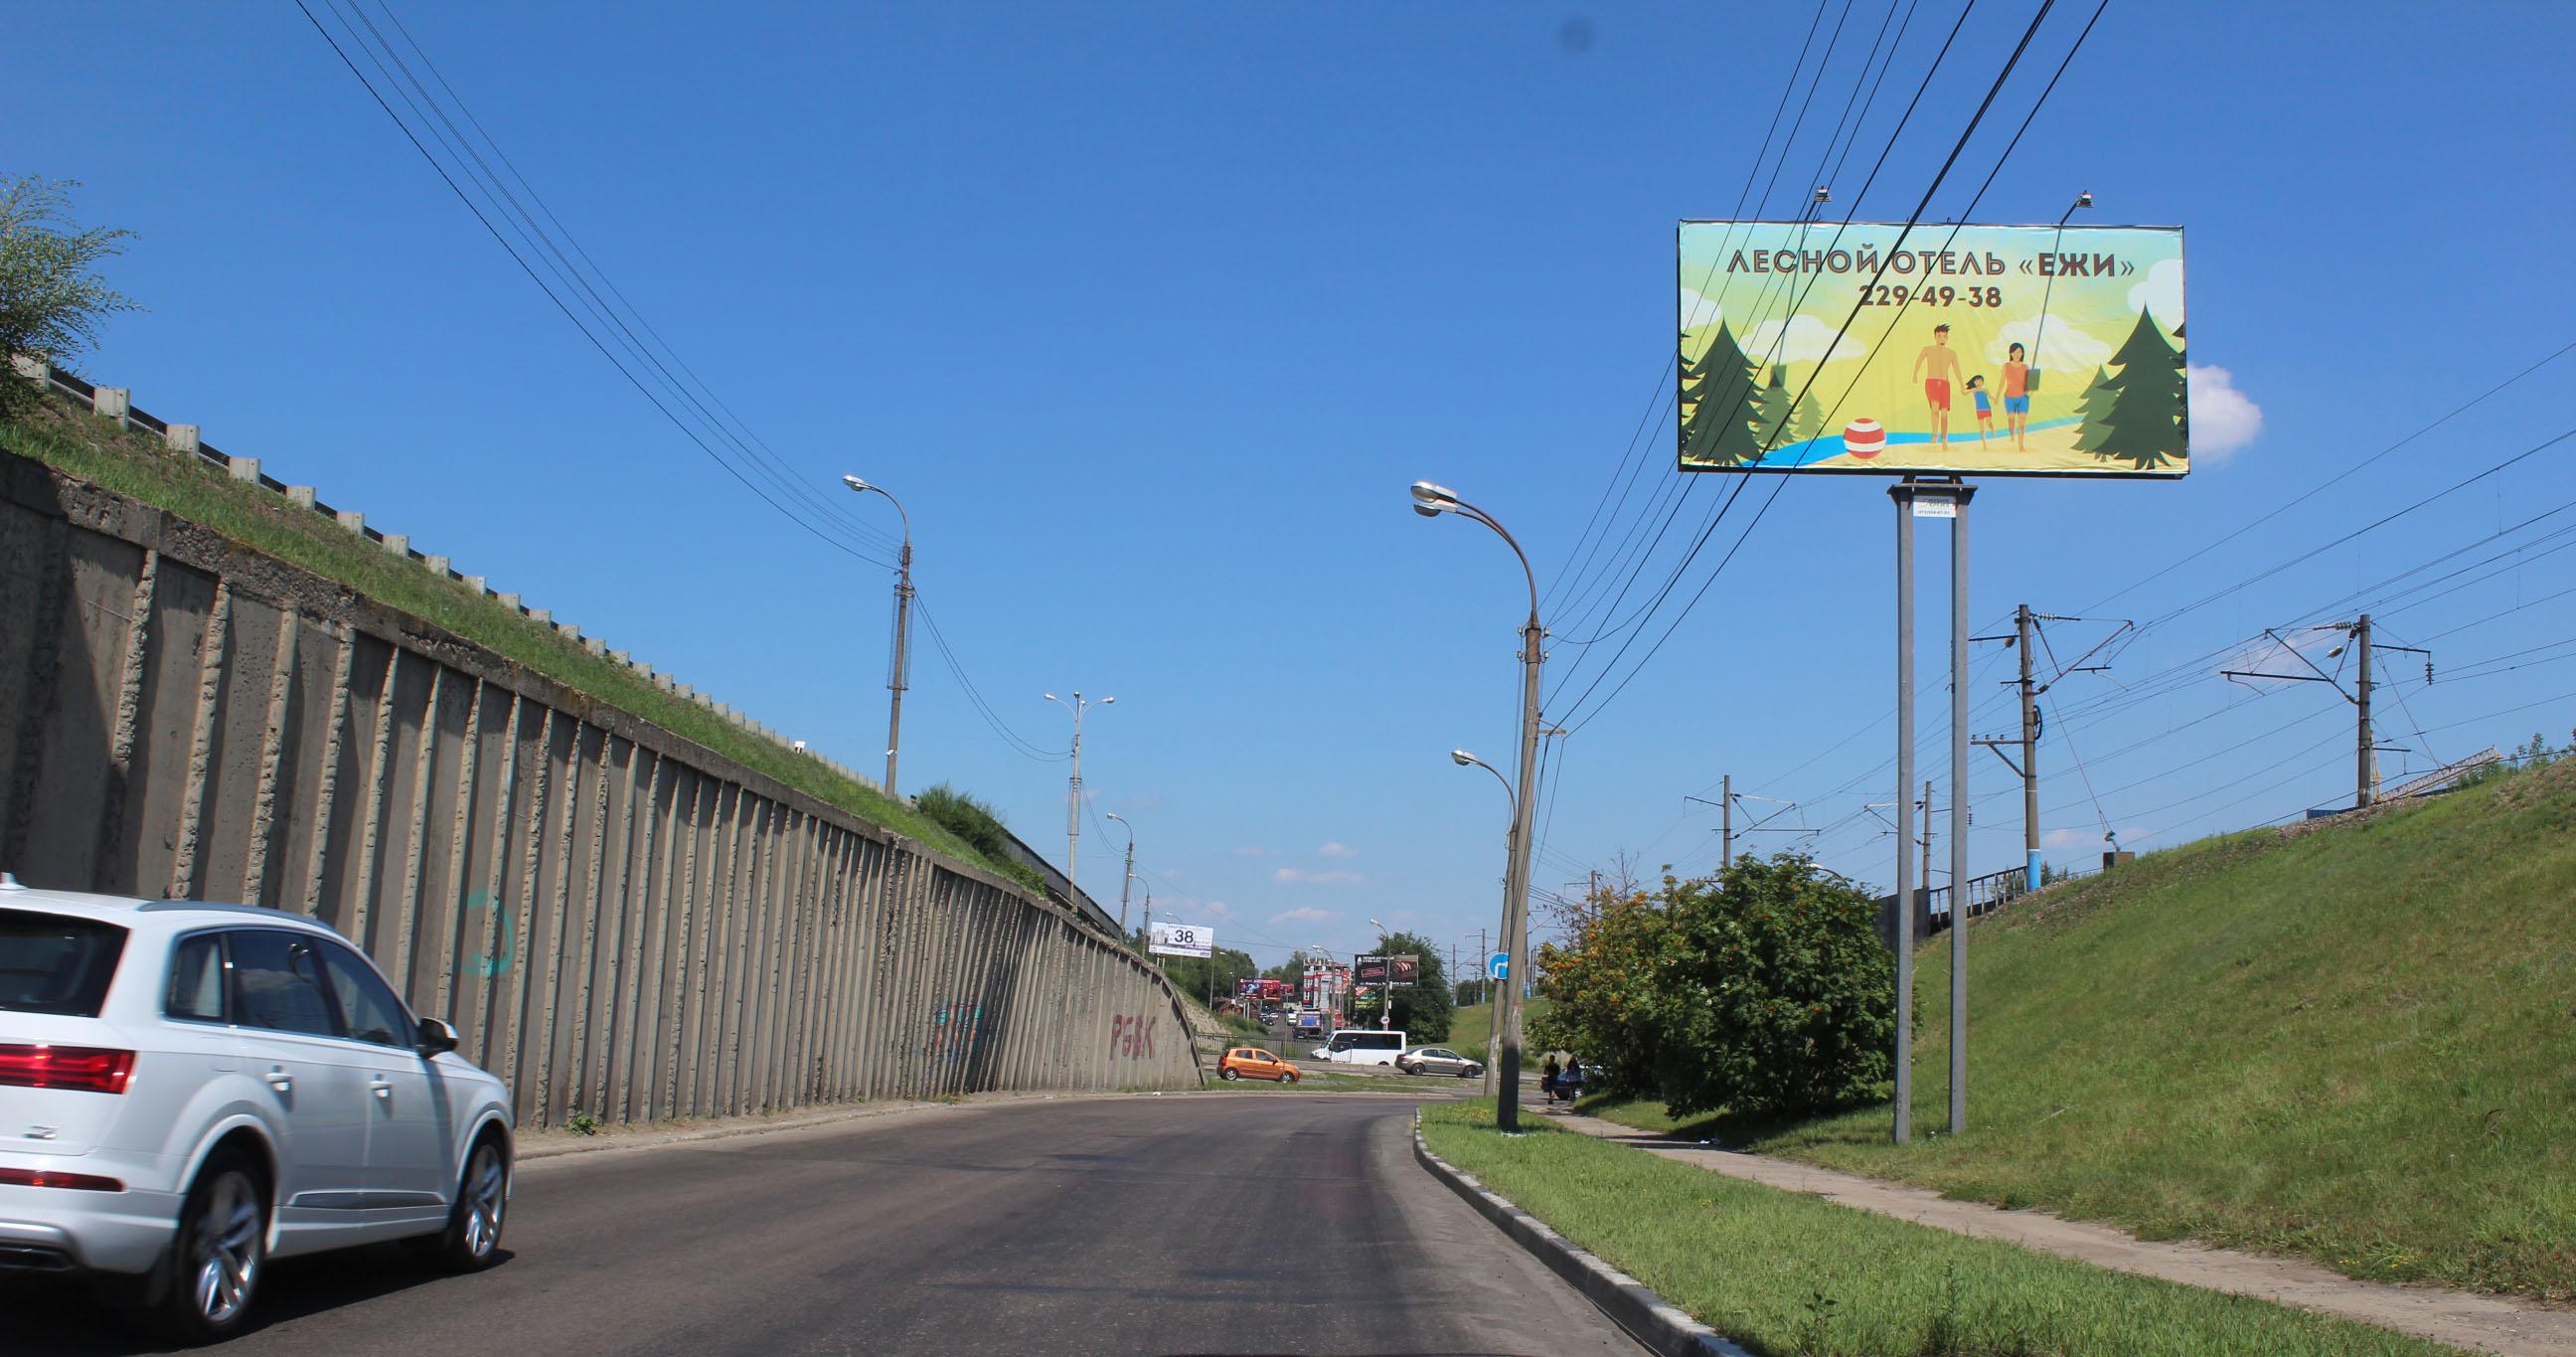 604 Ул.Ленина-въезд на Северный мост